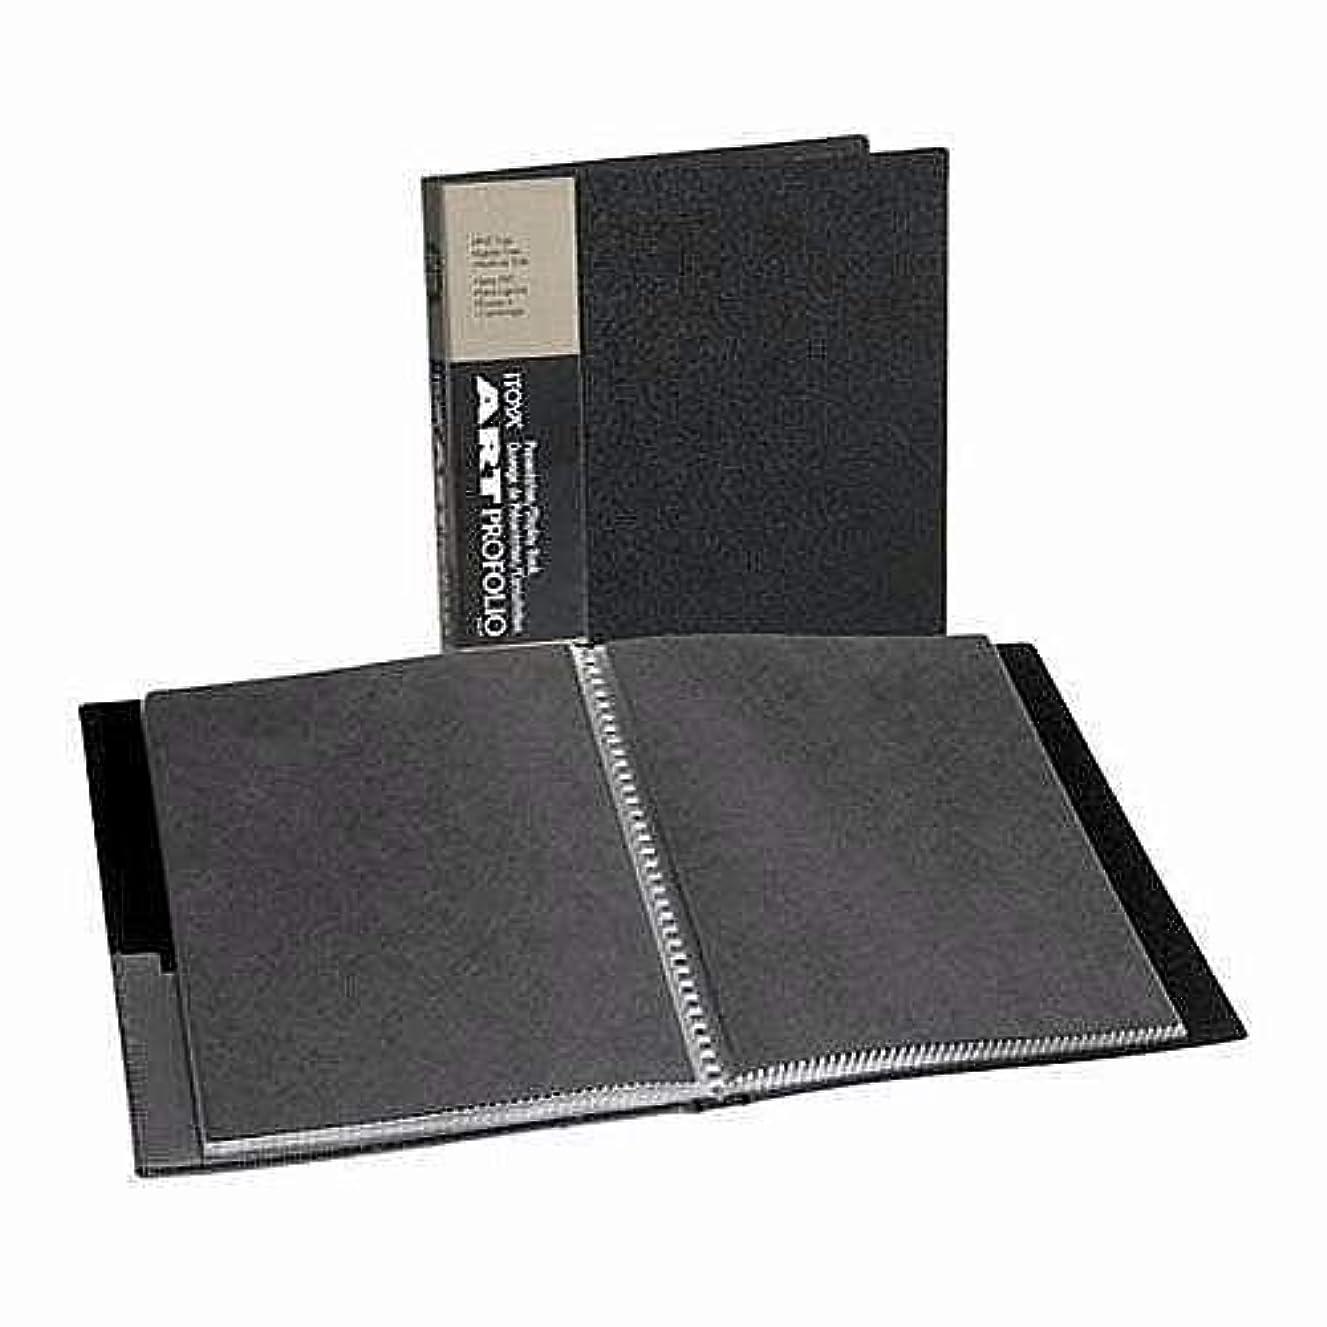 Itoya Art Profolio Storage/Display Book 8 in. x 10 in. 24